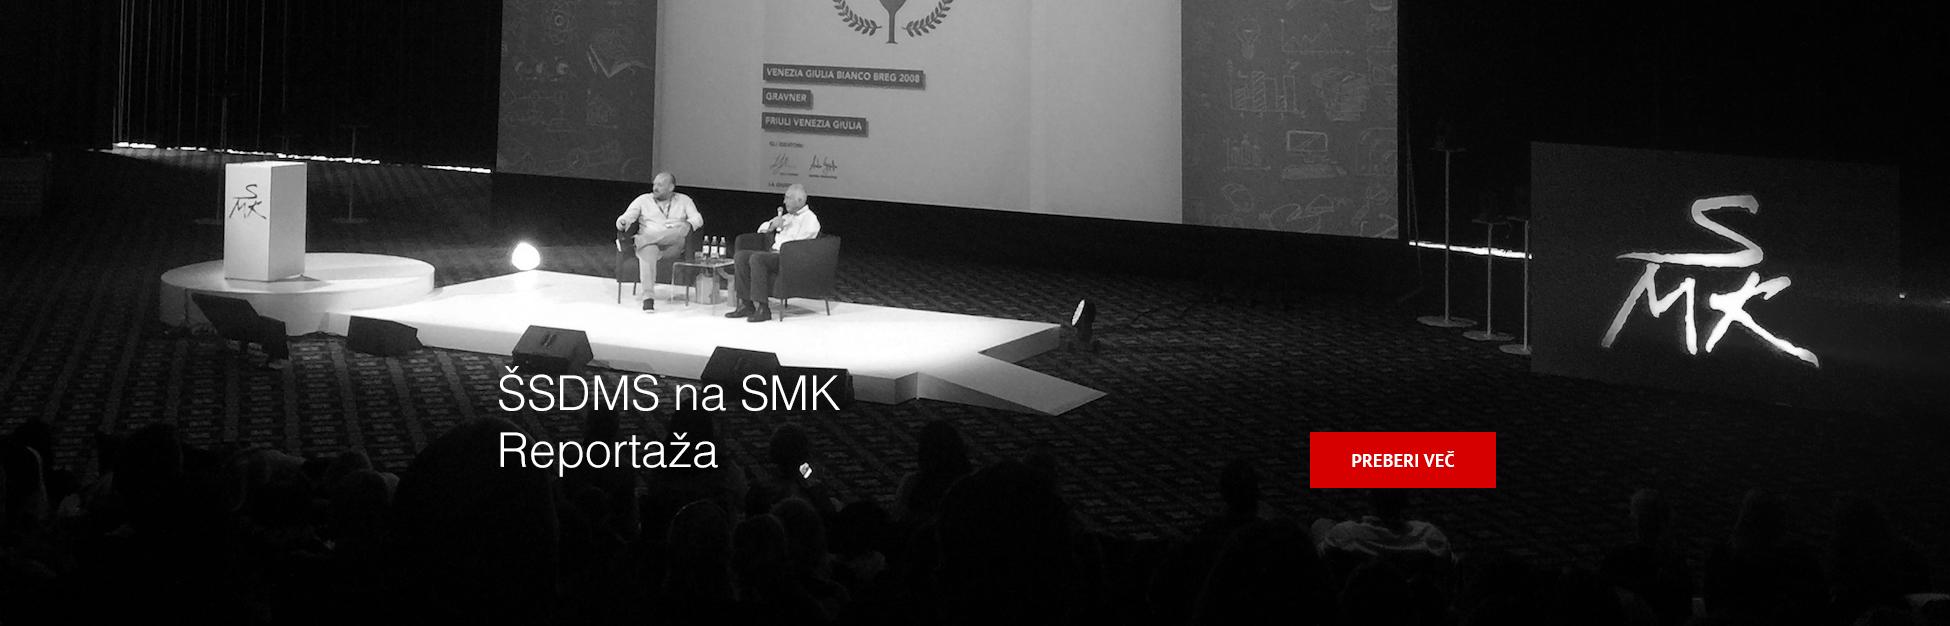 ssdms_na_smk_cover